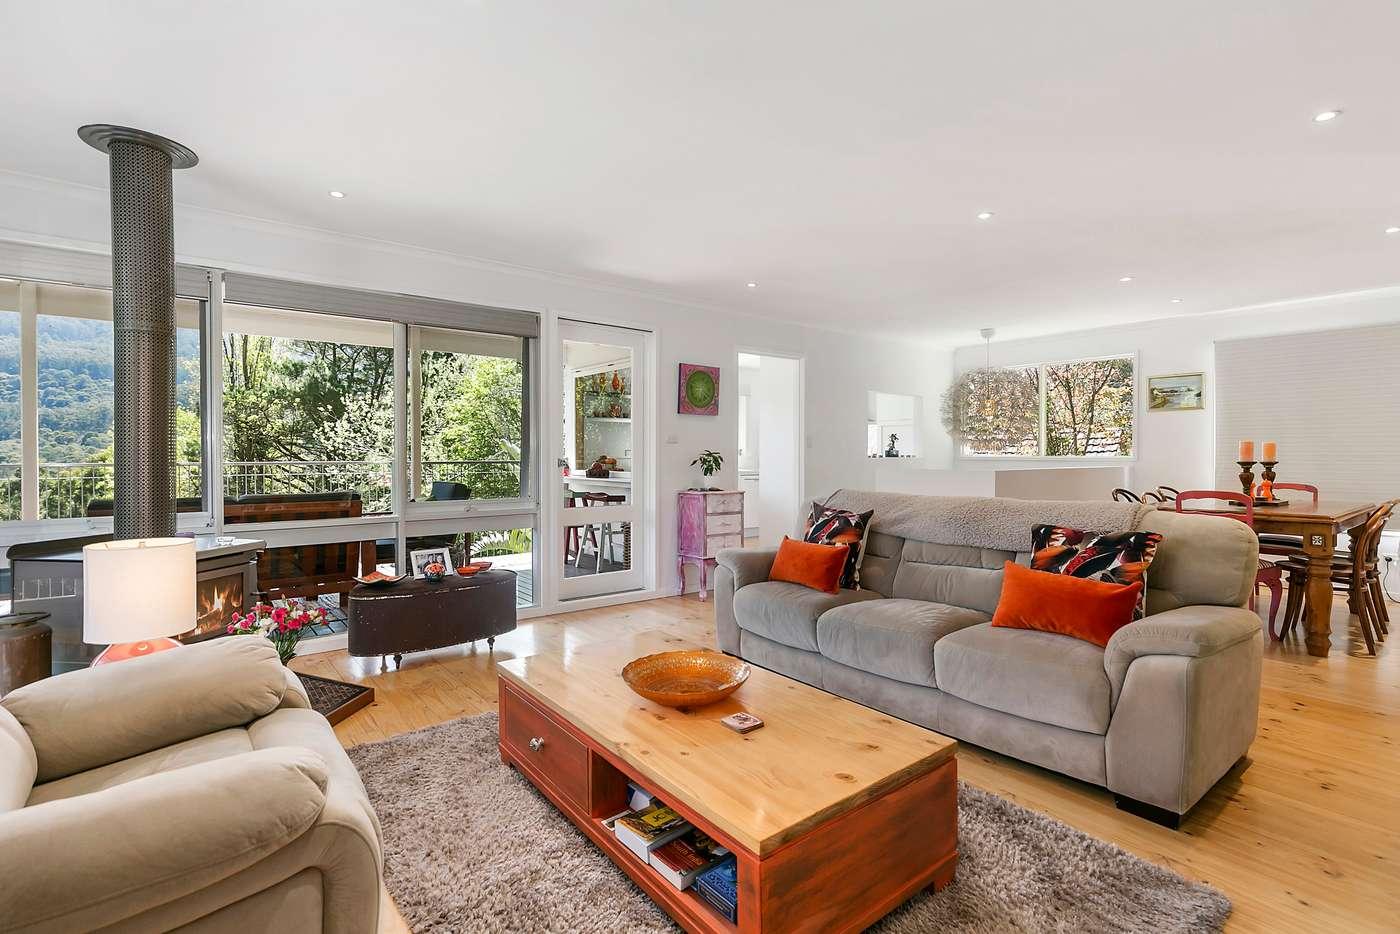 Fifth view of Homely house listing, 4 Mildura Avenue, Warburton VIC 3799